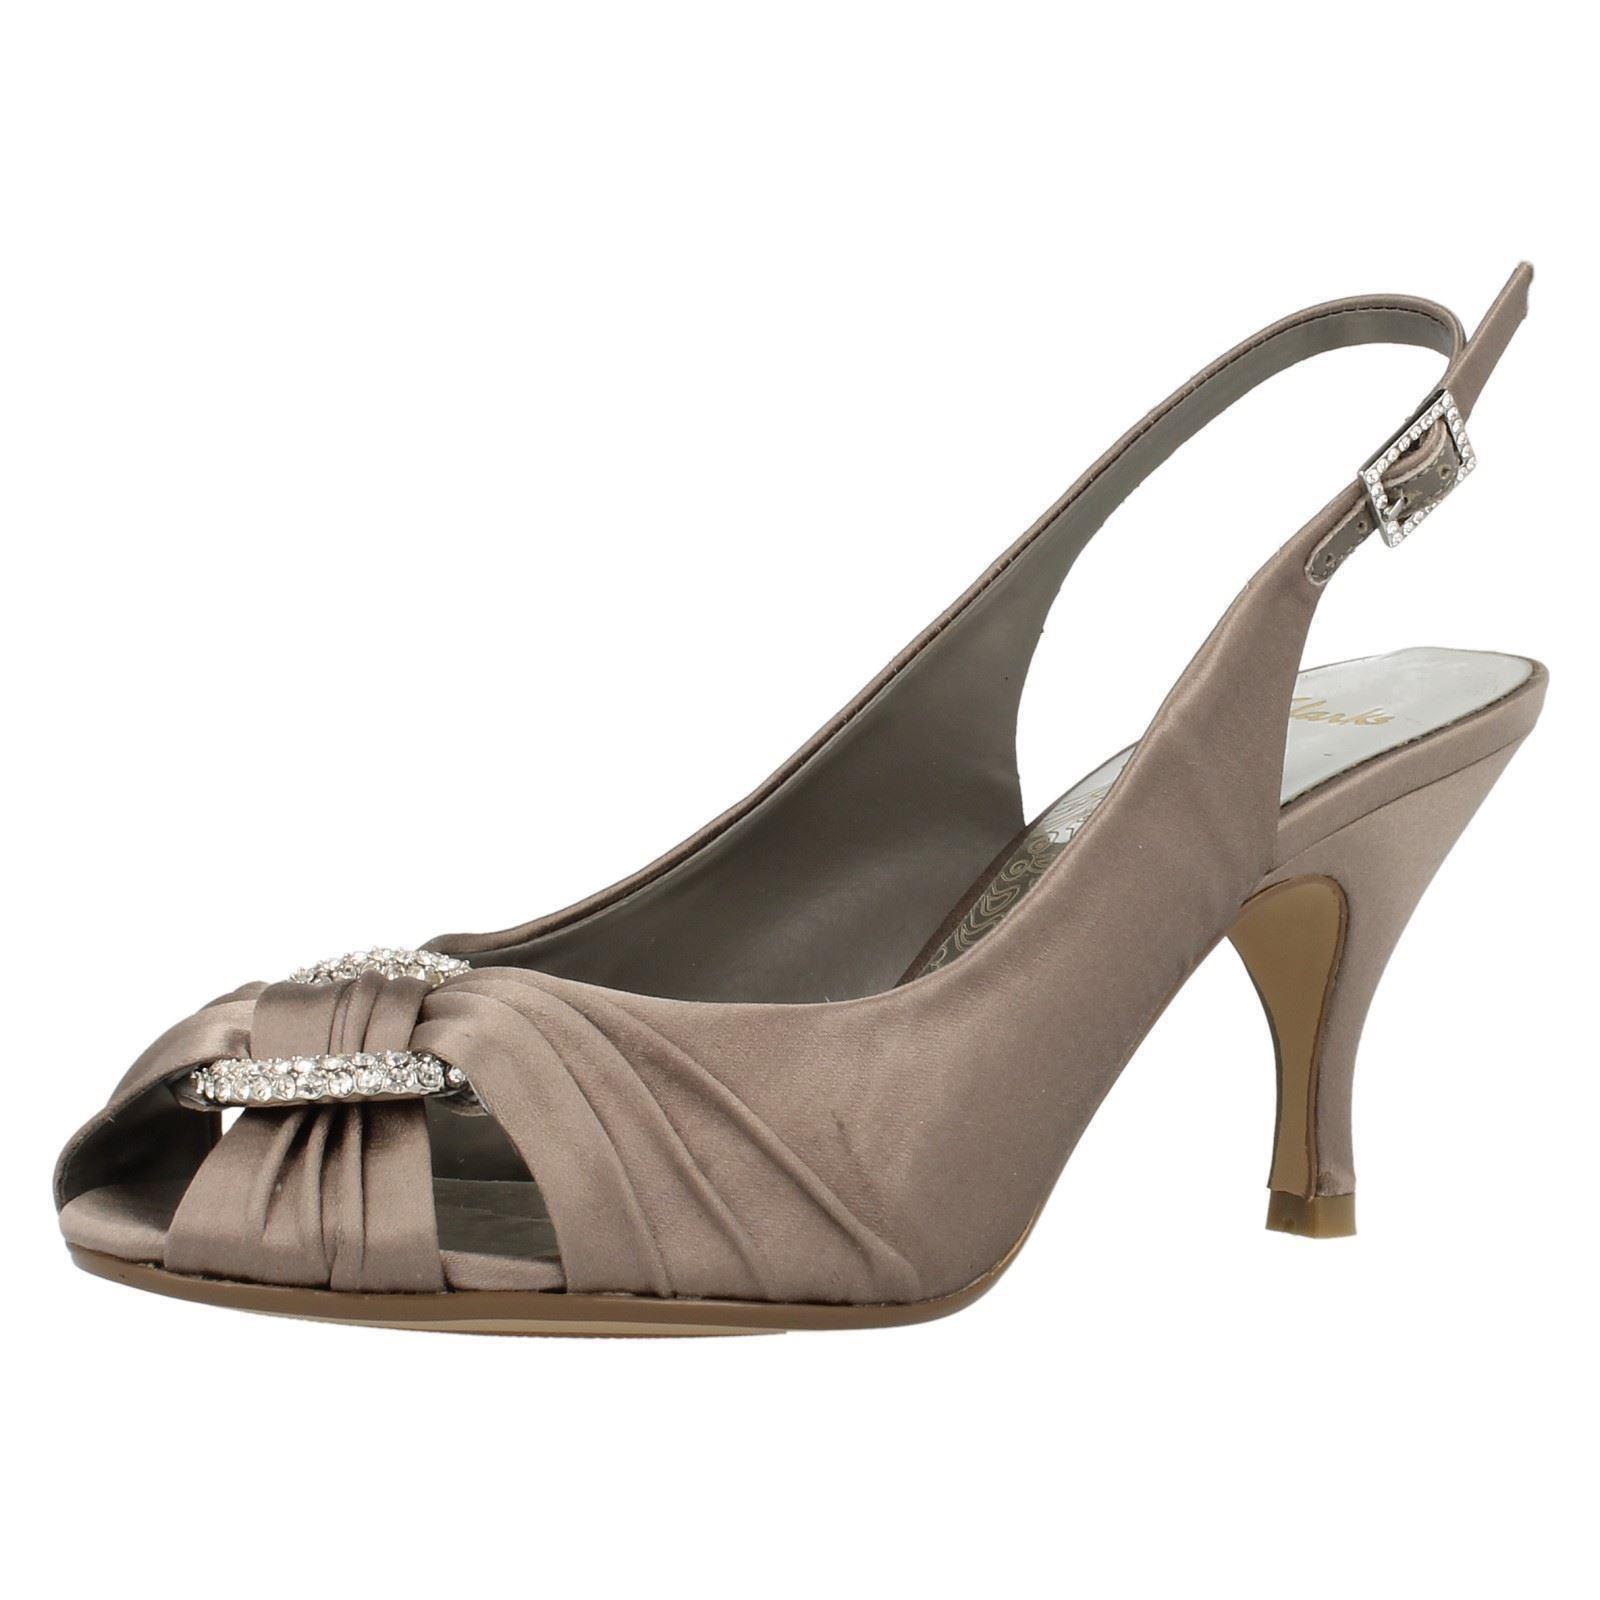 Aerosole Wide Womens Shoes